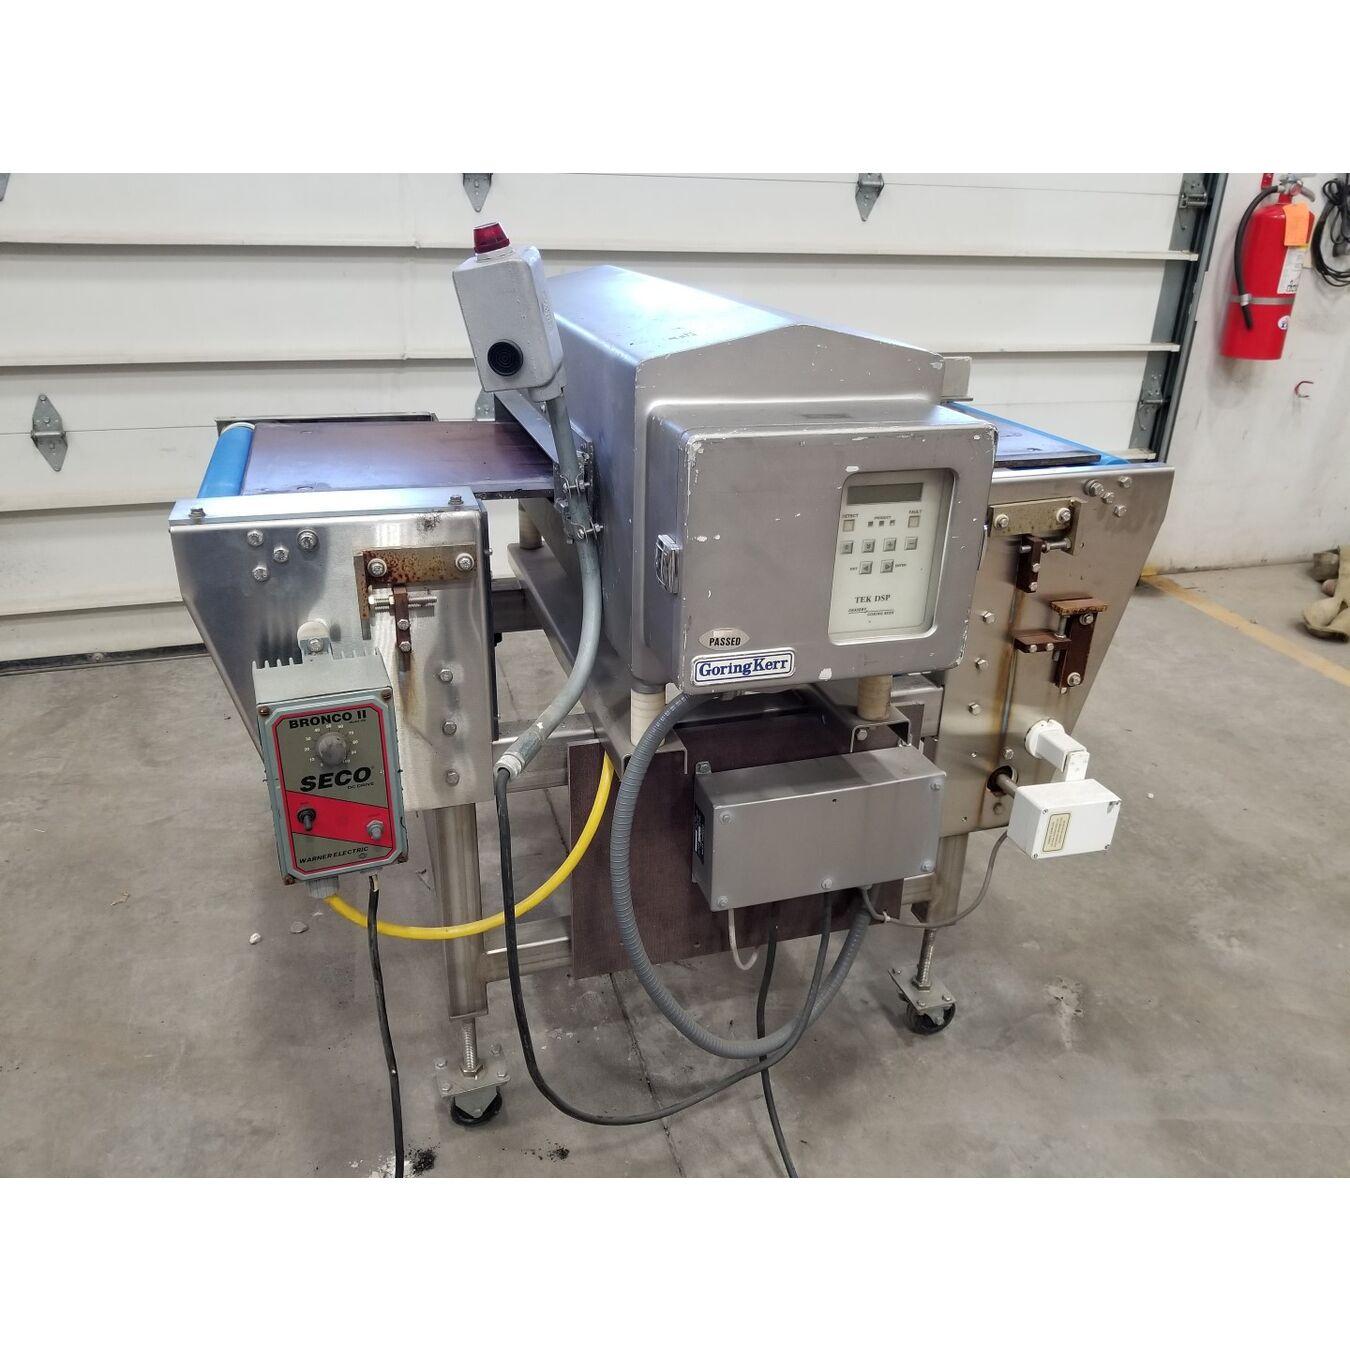 Used Goring Kerr Portable Metal Detector Conveyor With